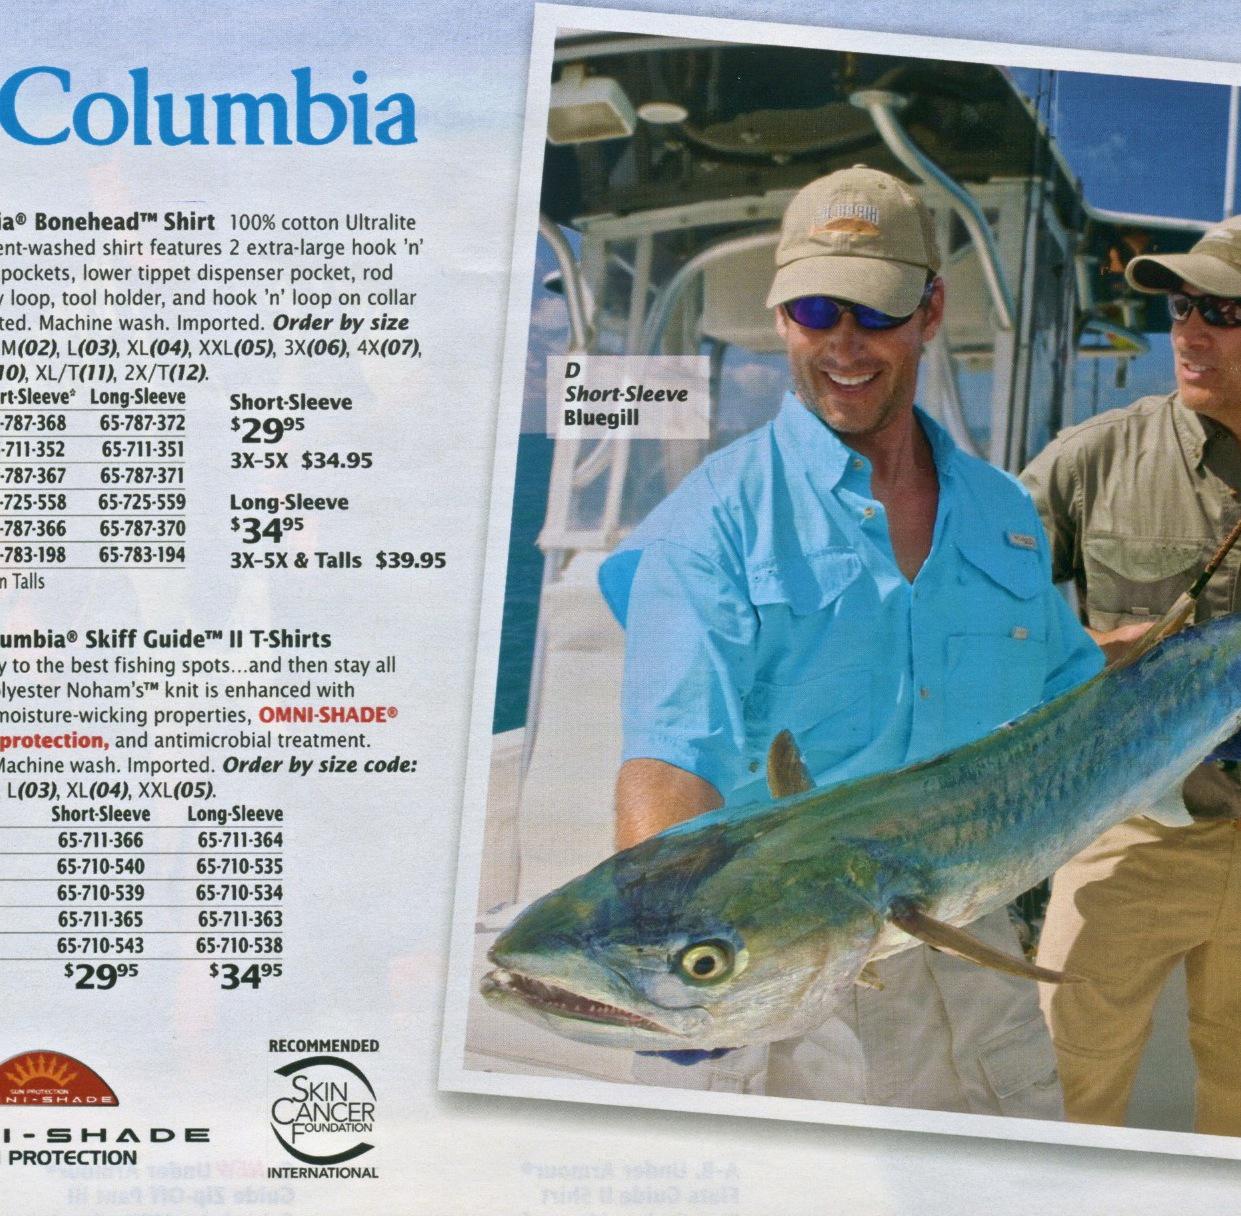 peter bass pro catalog 2010 4LG